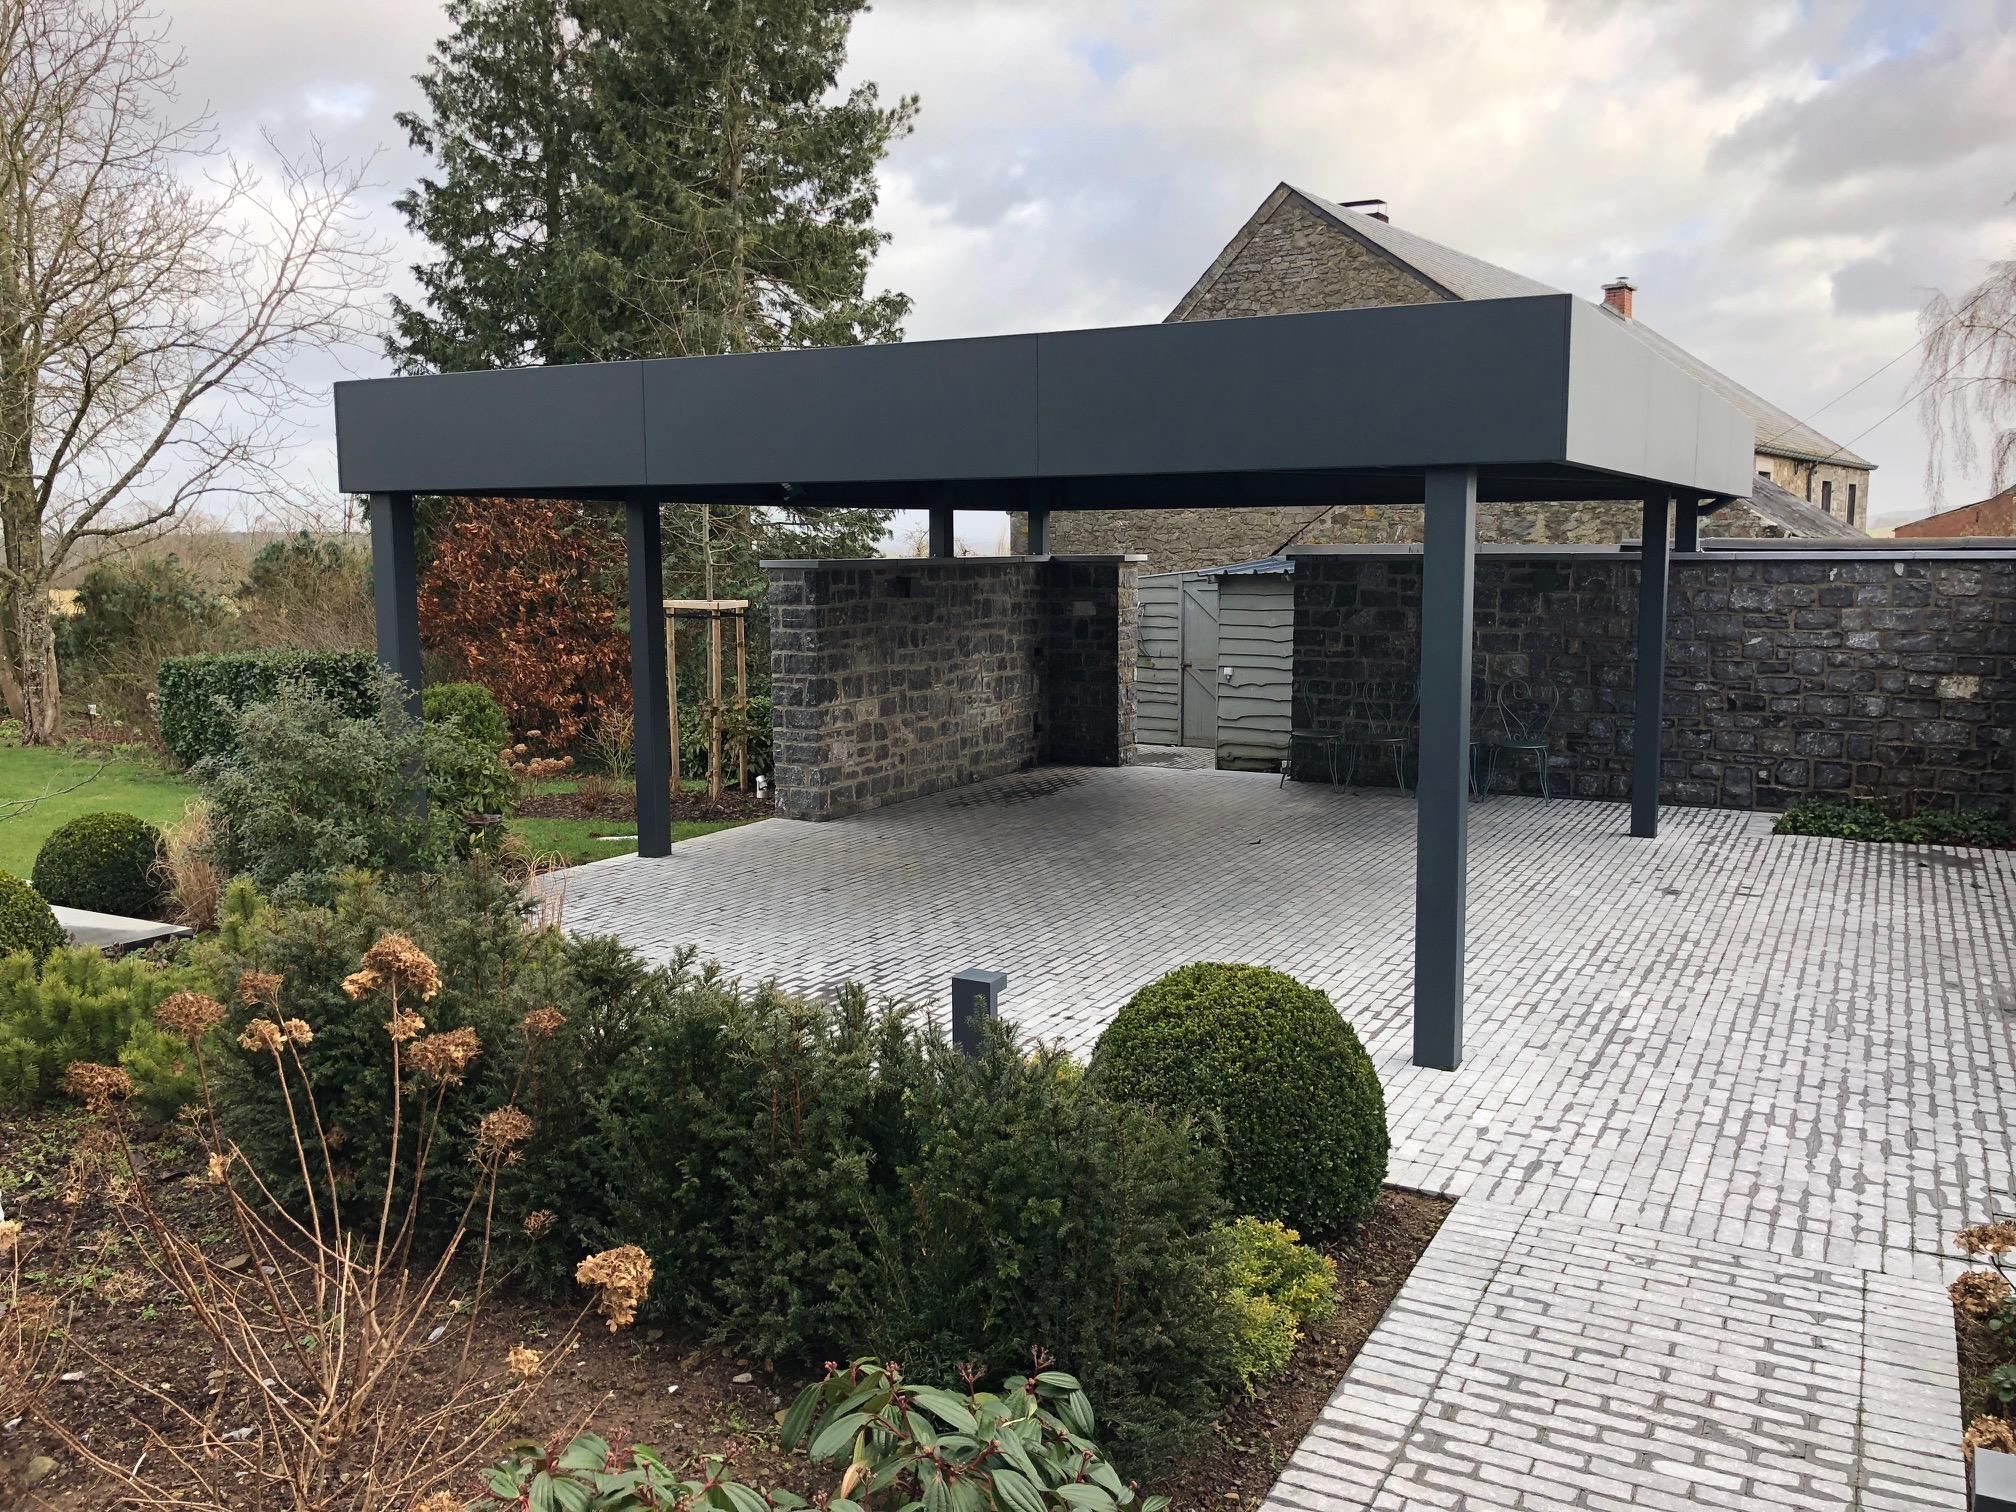 carport alu belgique stunning aluminum double carport with carport alu belgique best perfect. Black Bedroom Furniture Sets. Home Design Ideas